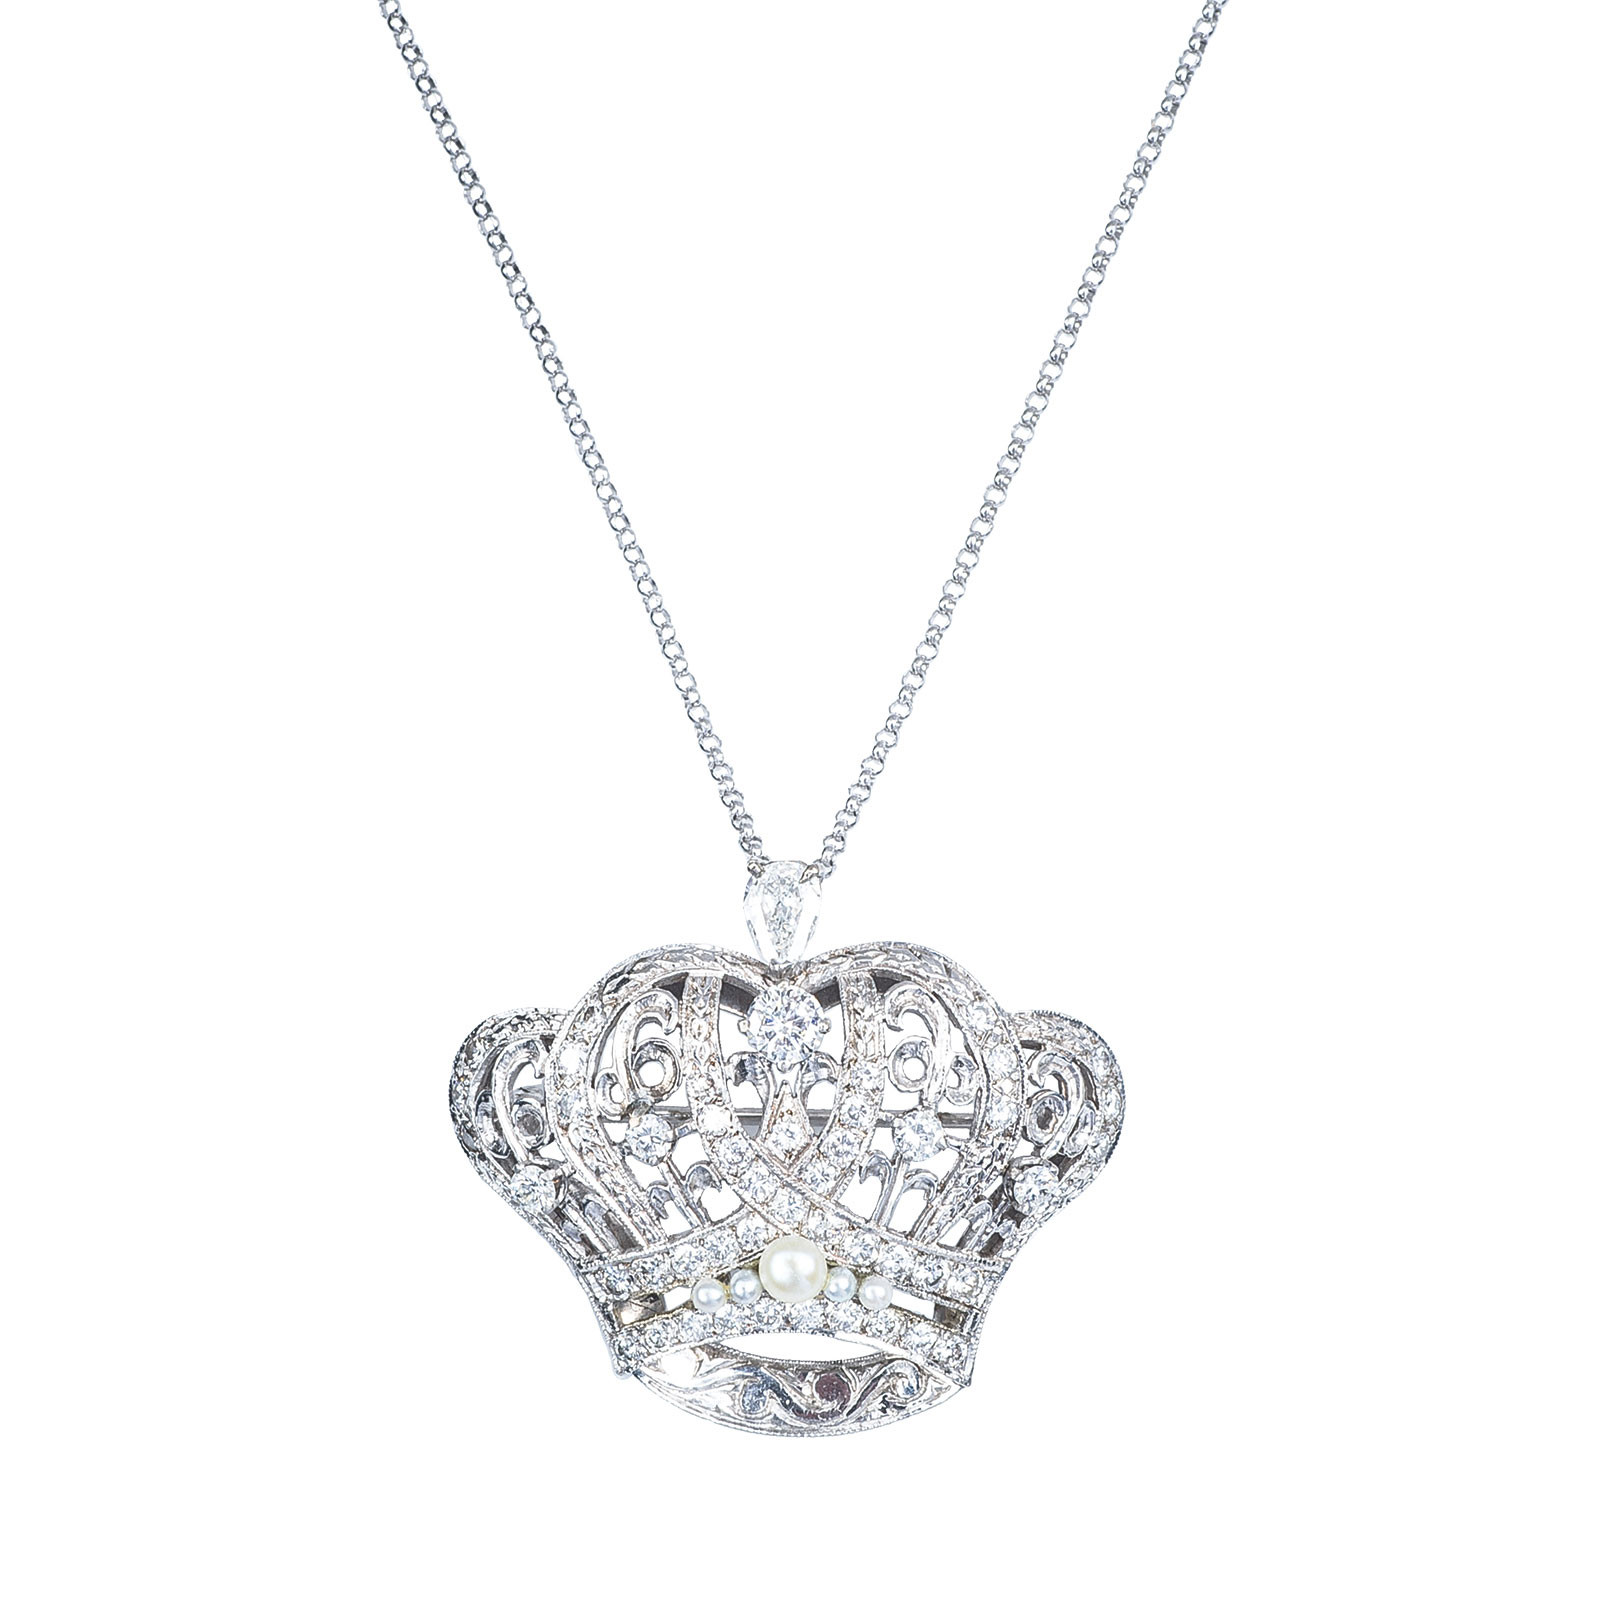 Vintage 1.95 CTW Diamond & Pearl Necklace